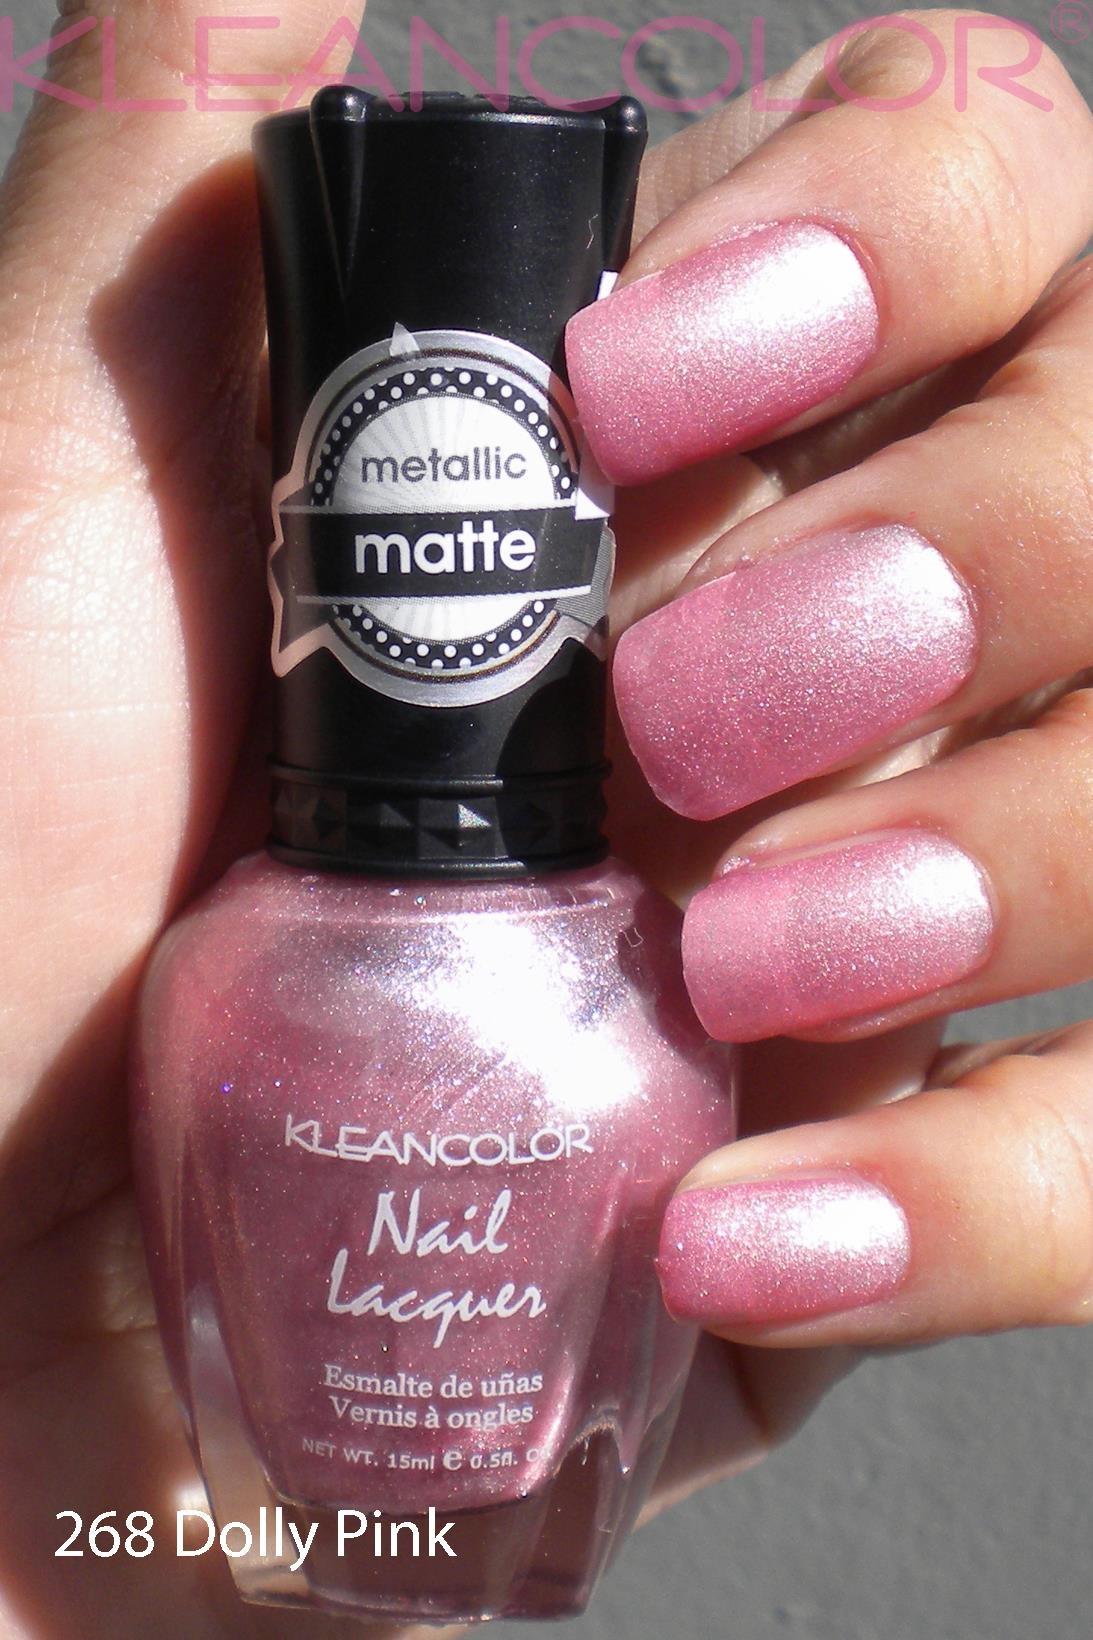 Nagellak dolly pink